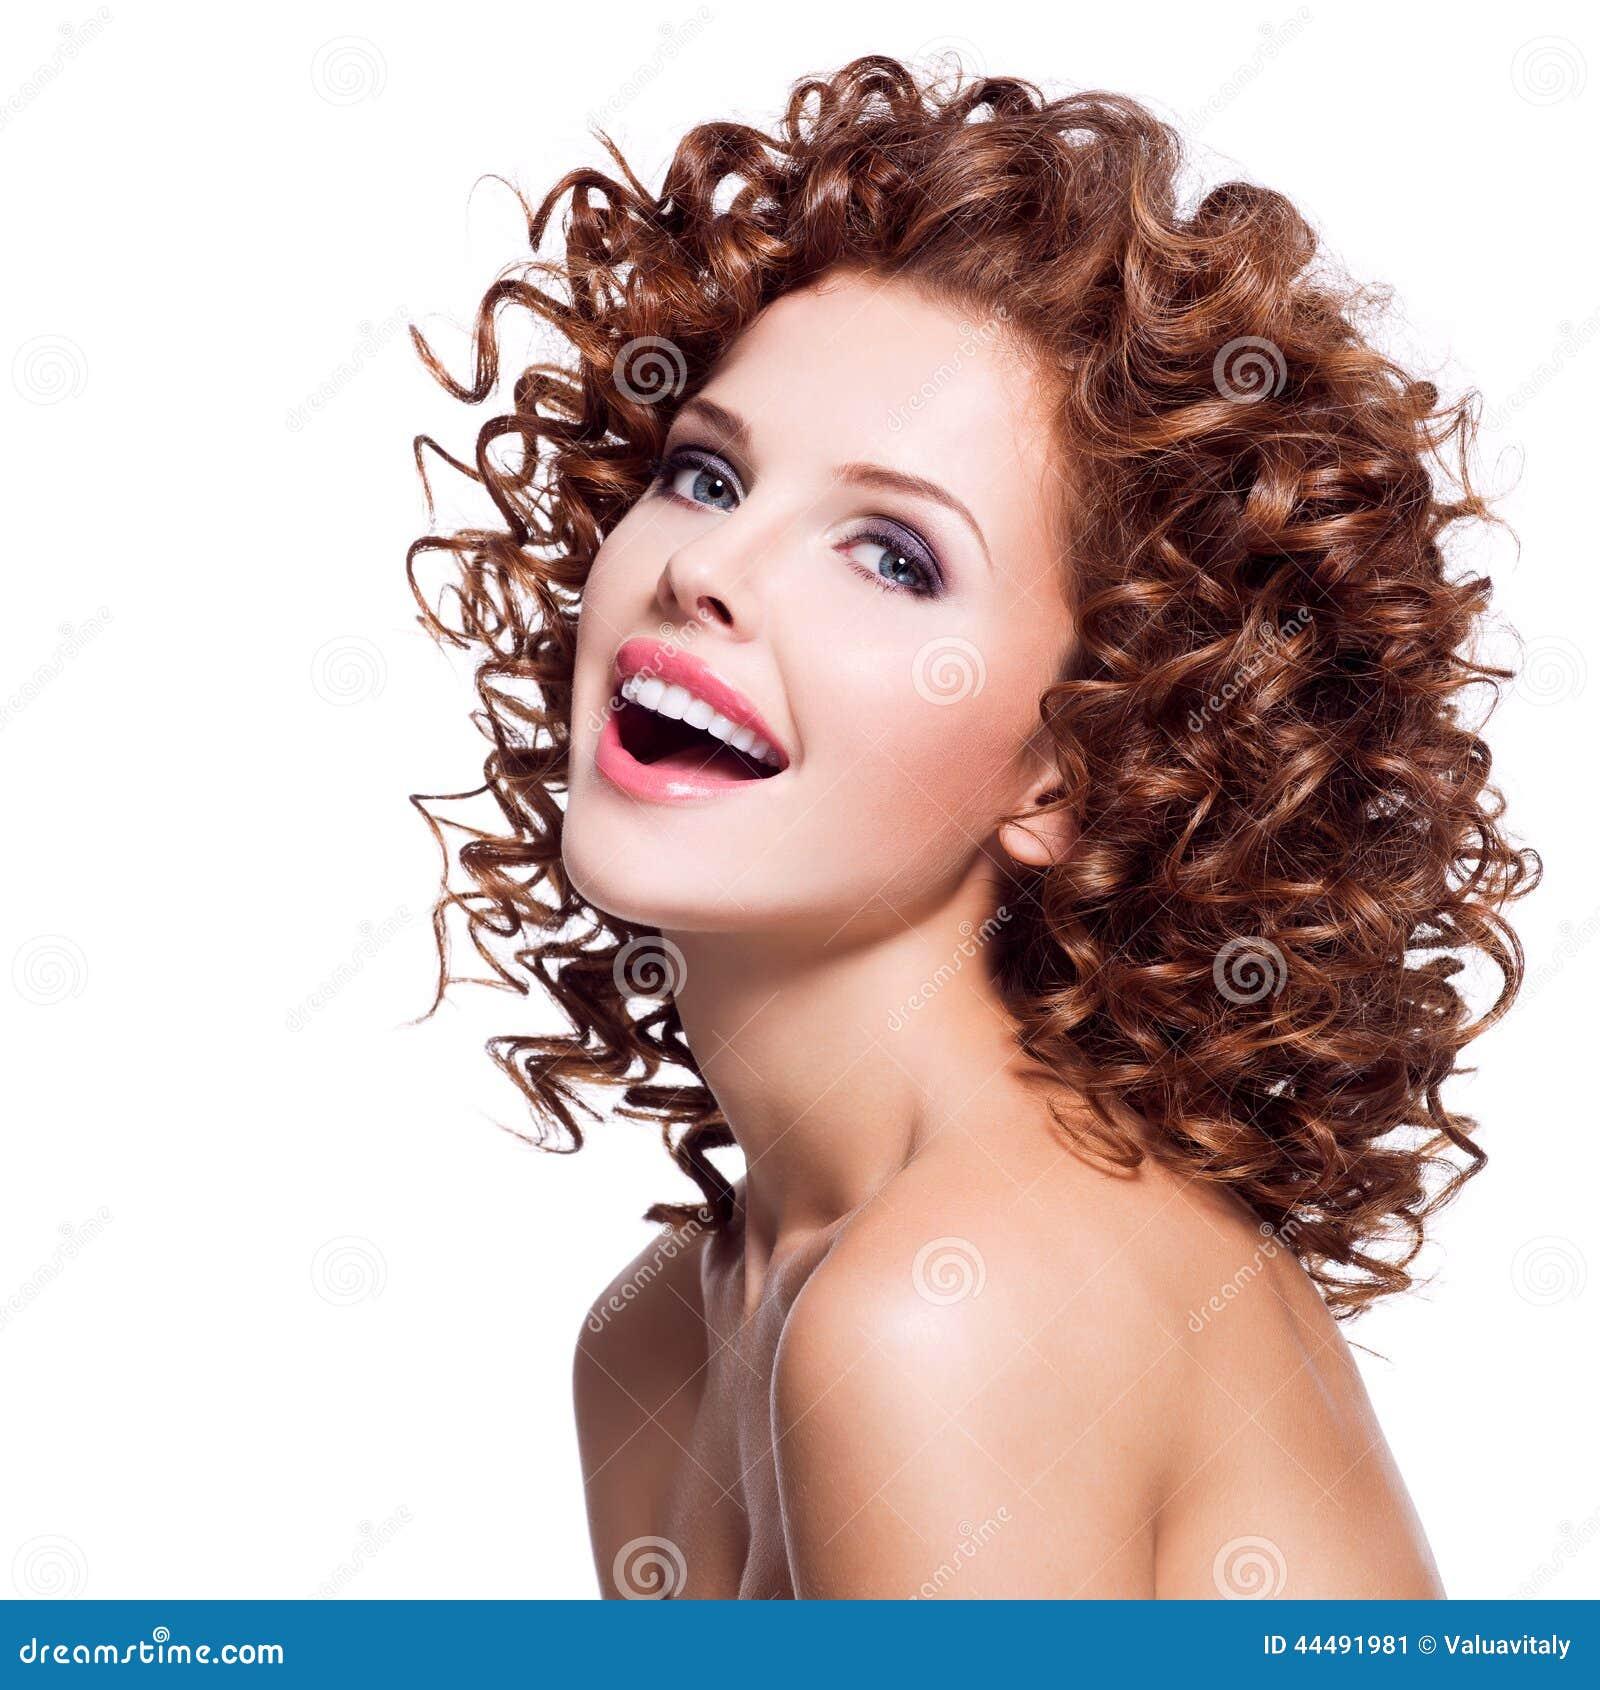 Mulher de riso bonita com cabelo encaracolado moreno